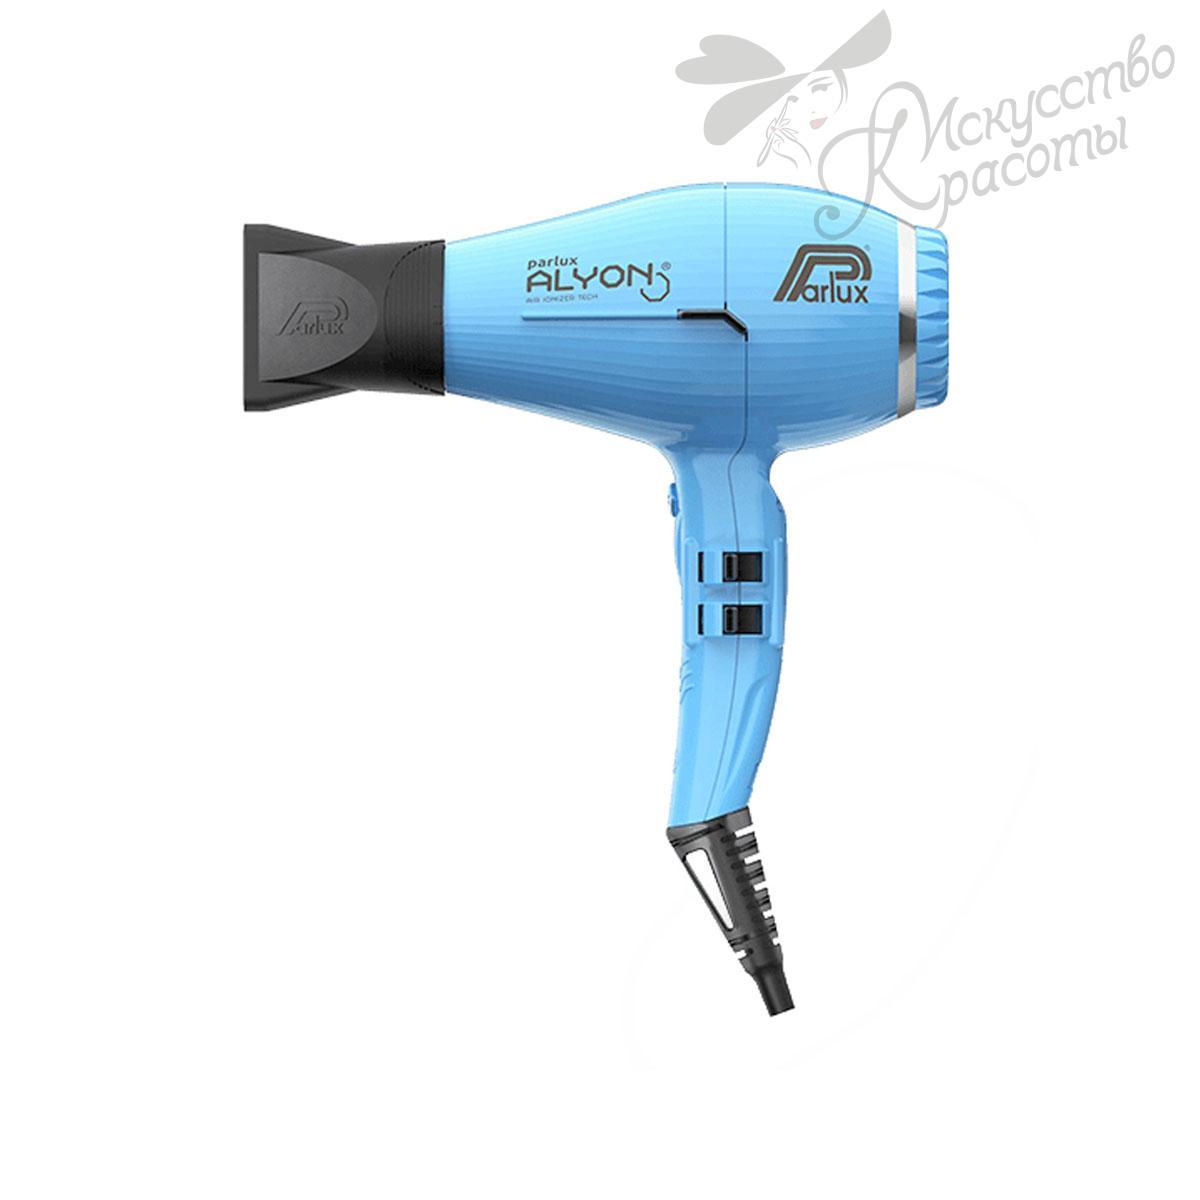 Фен для волос Parlux Alyon Turquoise 2250W